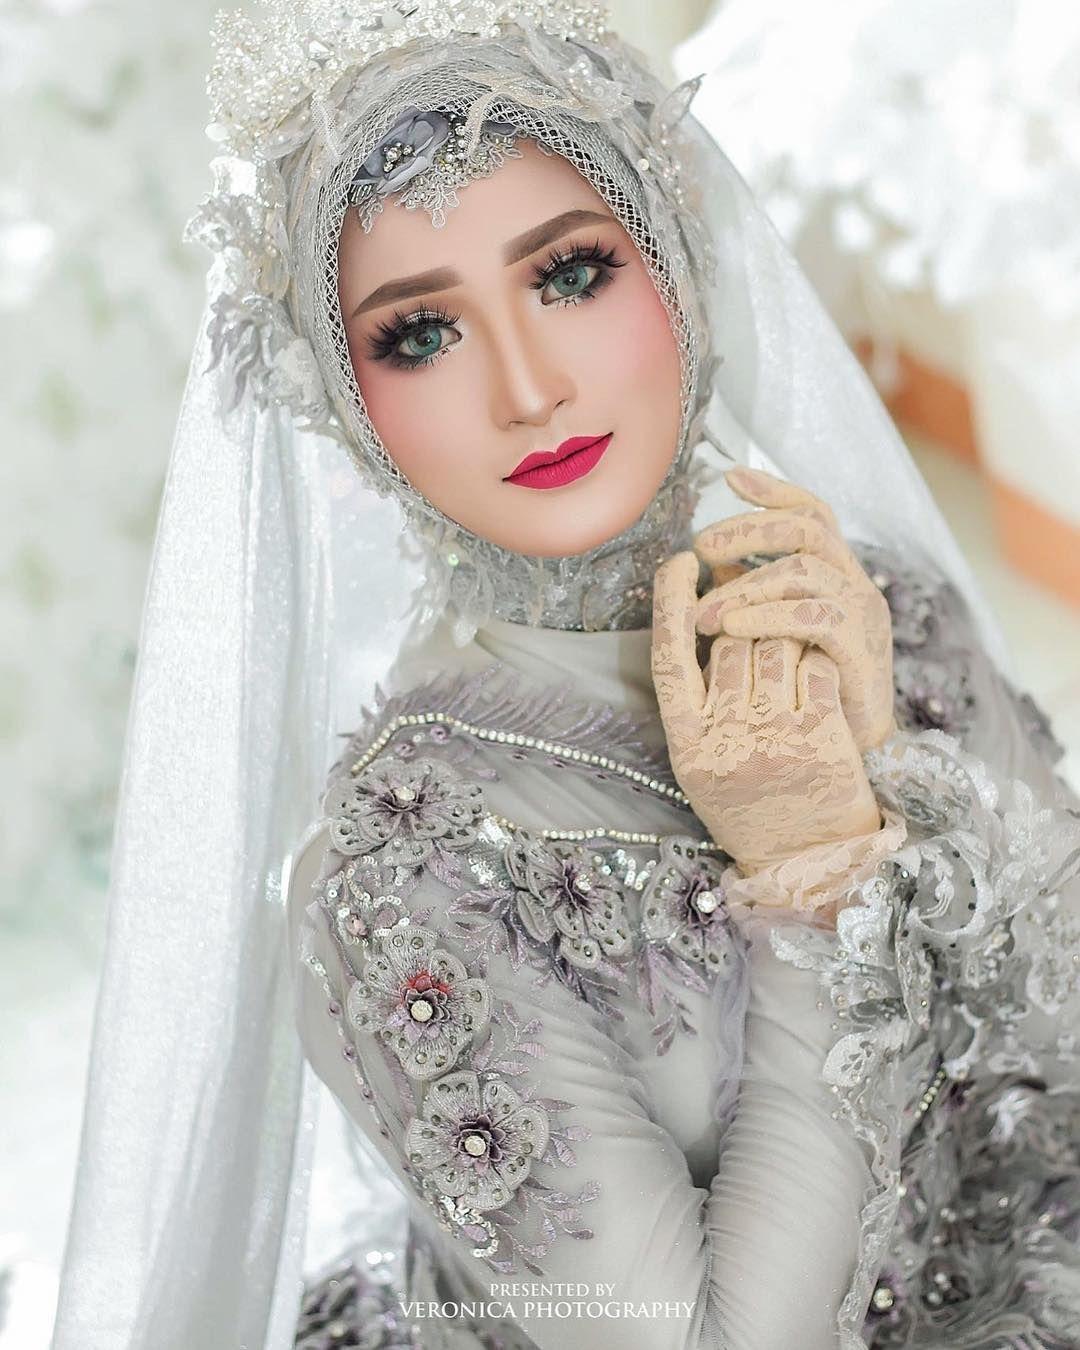 Dekorasi Mua Bridal Kebaya Di Instagram Talent Laraskurnia 18 Make Up By Helena Wedding Owner Gown Desi Pengantin Wanita Pose Pengantin Gaya Pengantin